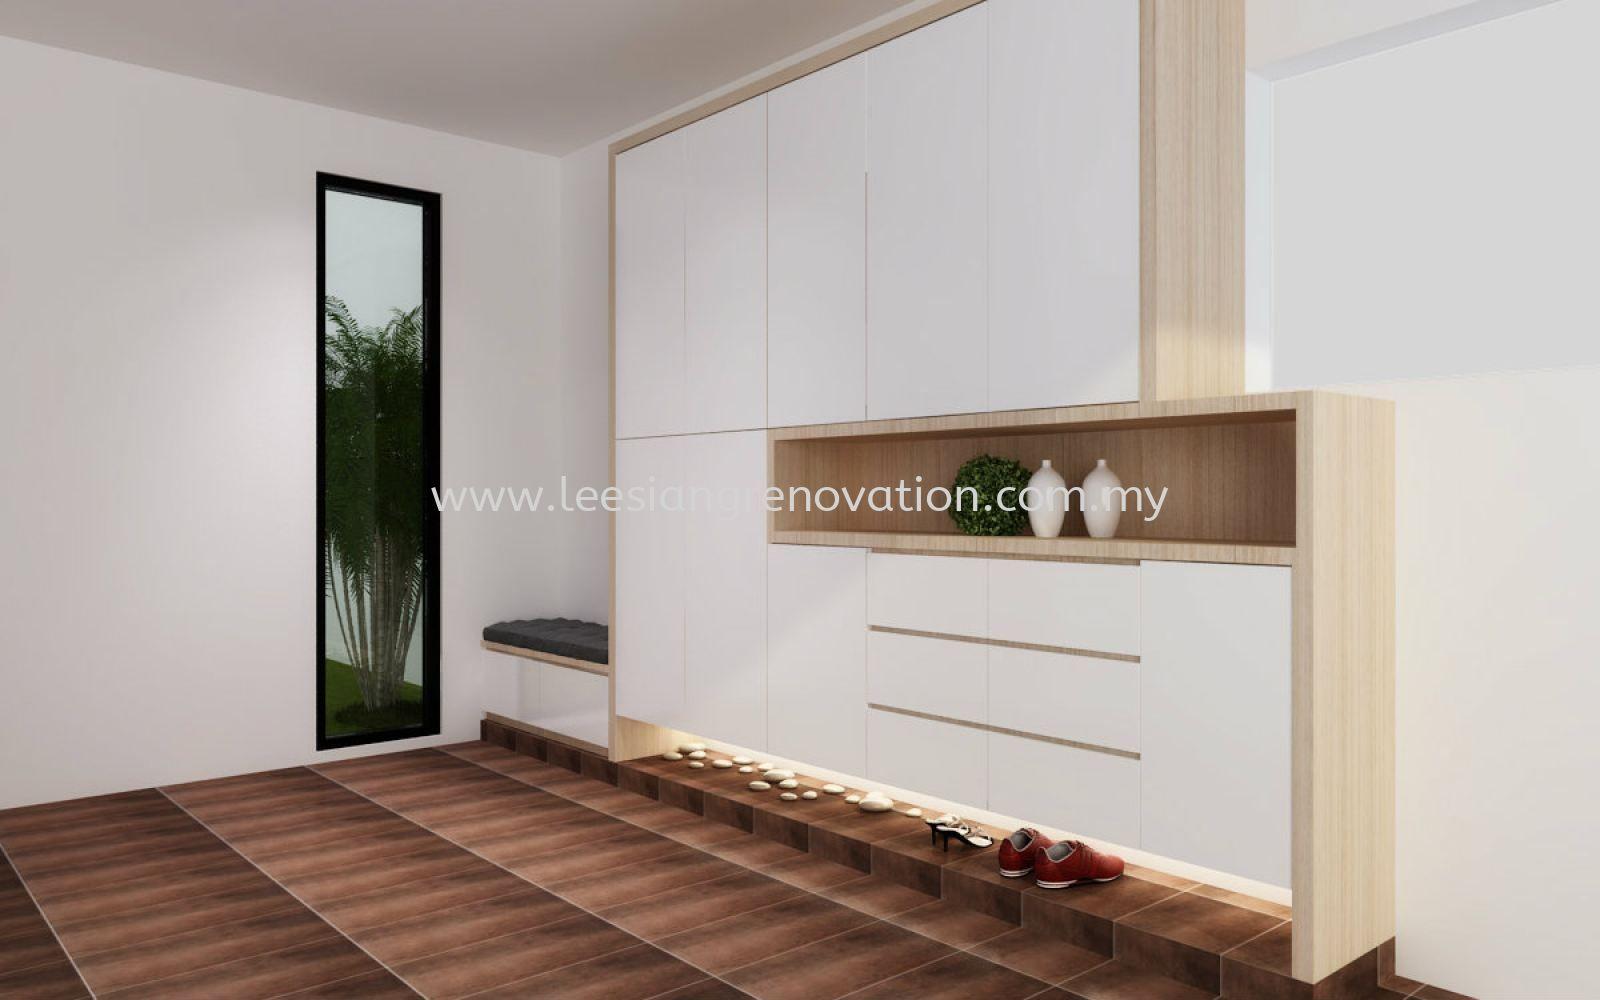 Shoe Cabinet Design JB, Johor Bahru, Malaysia renovation | Lee Siang ...